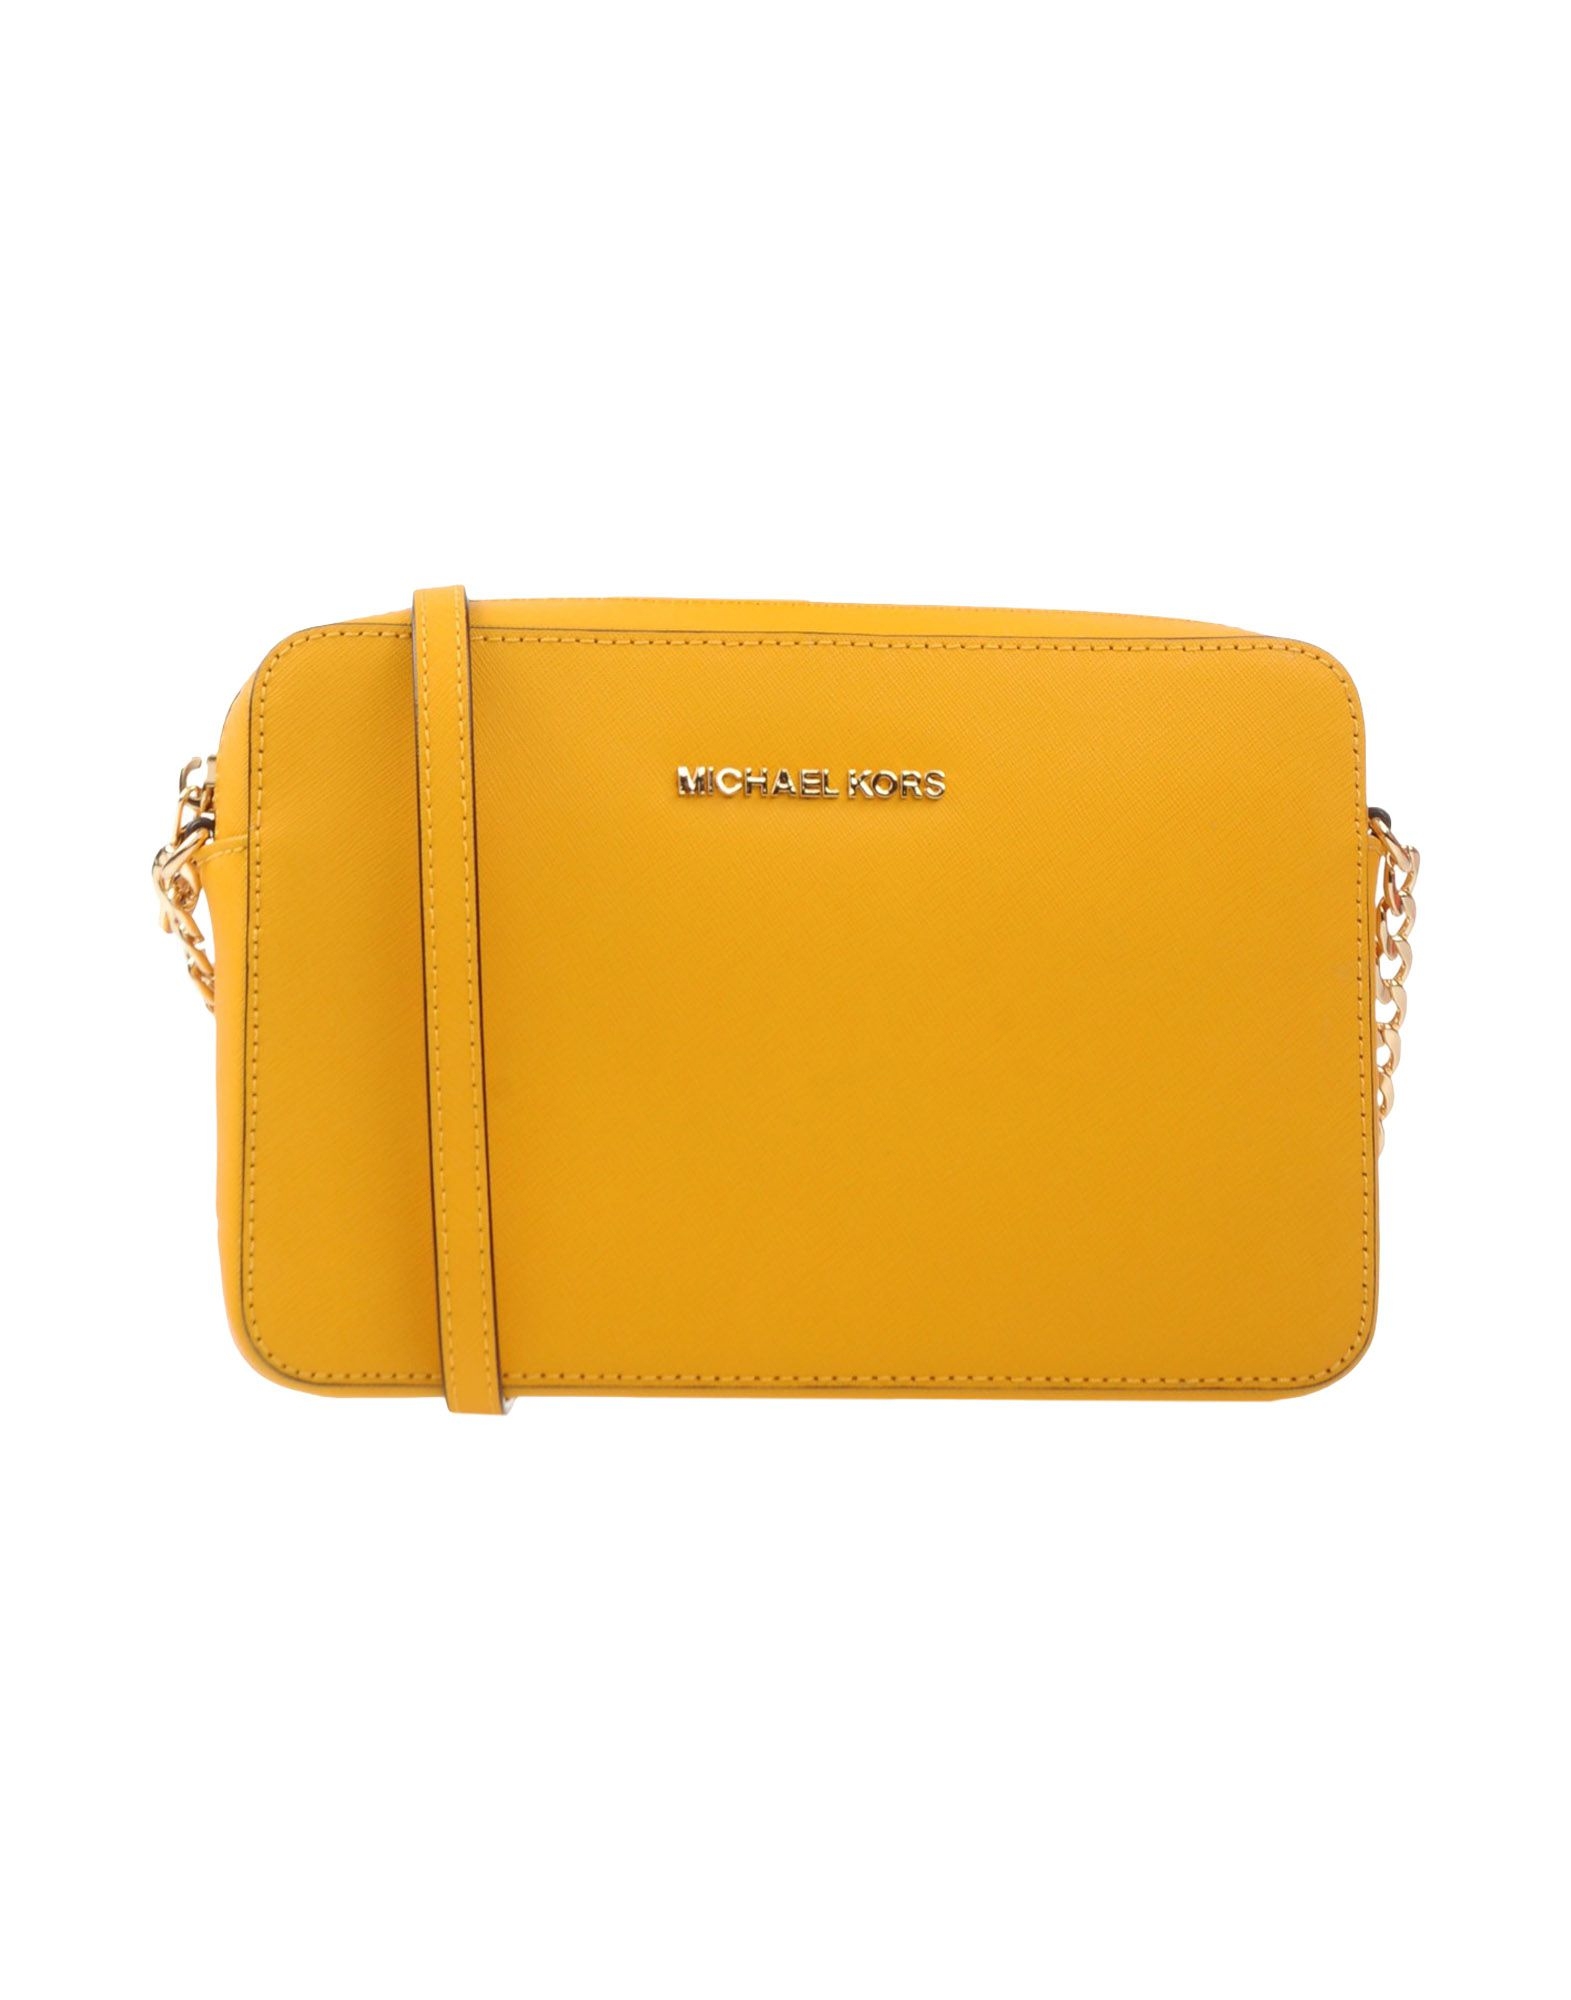 michael michael kors handbag in yellow lyst rh lyst com au